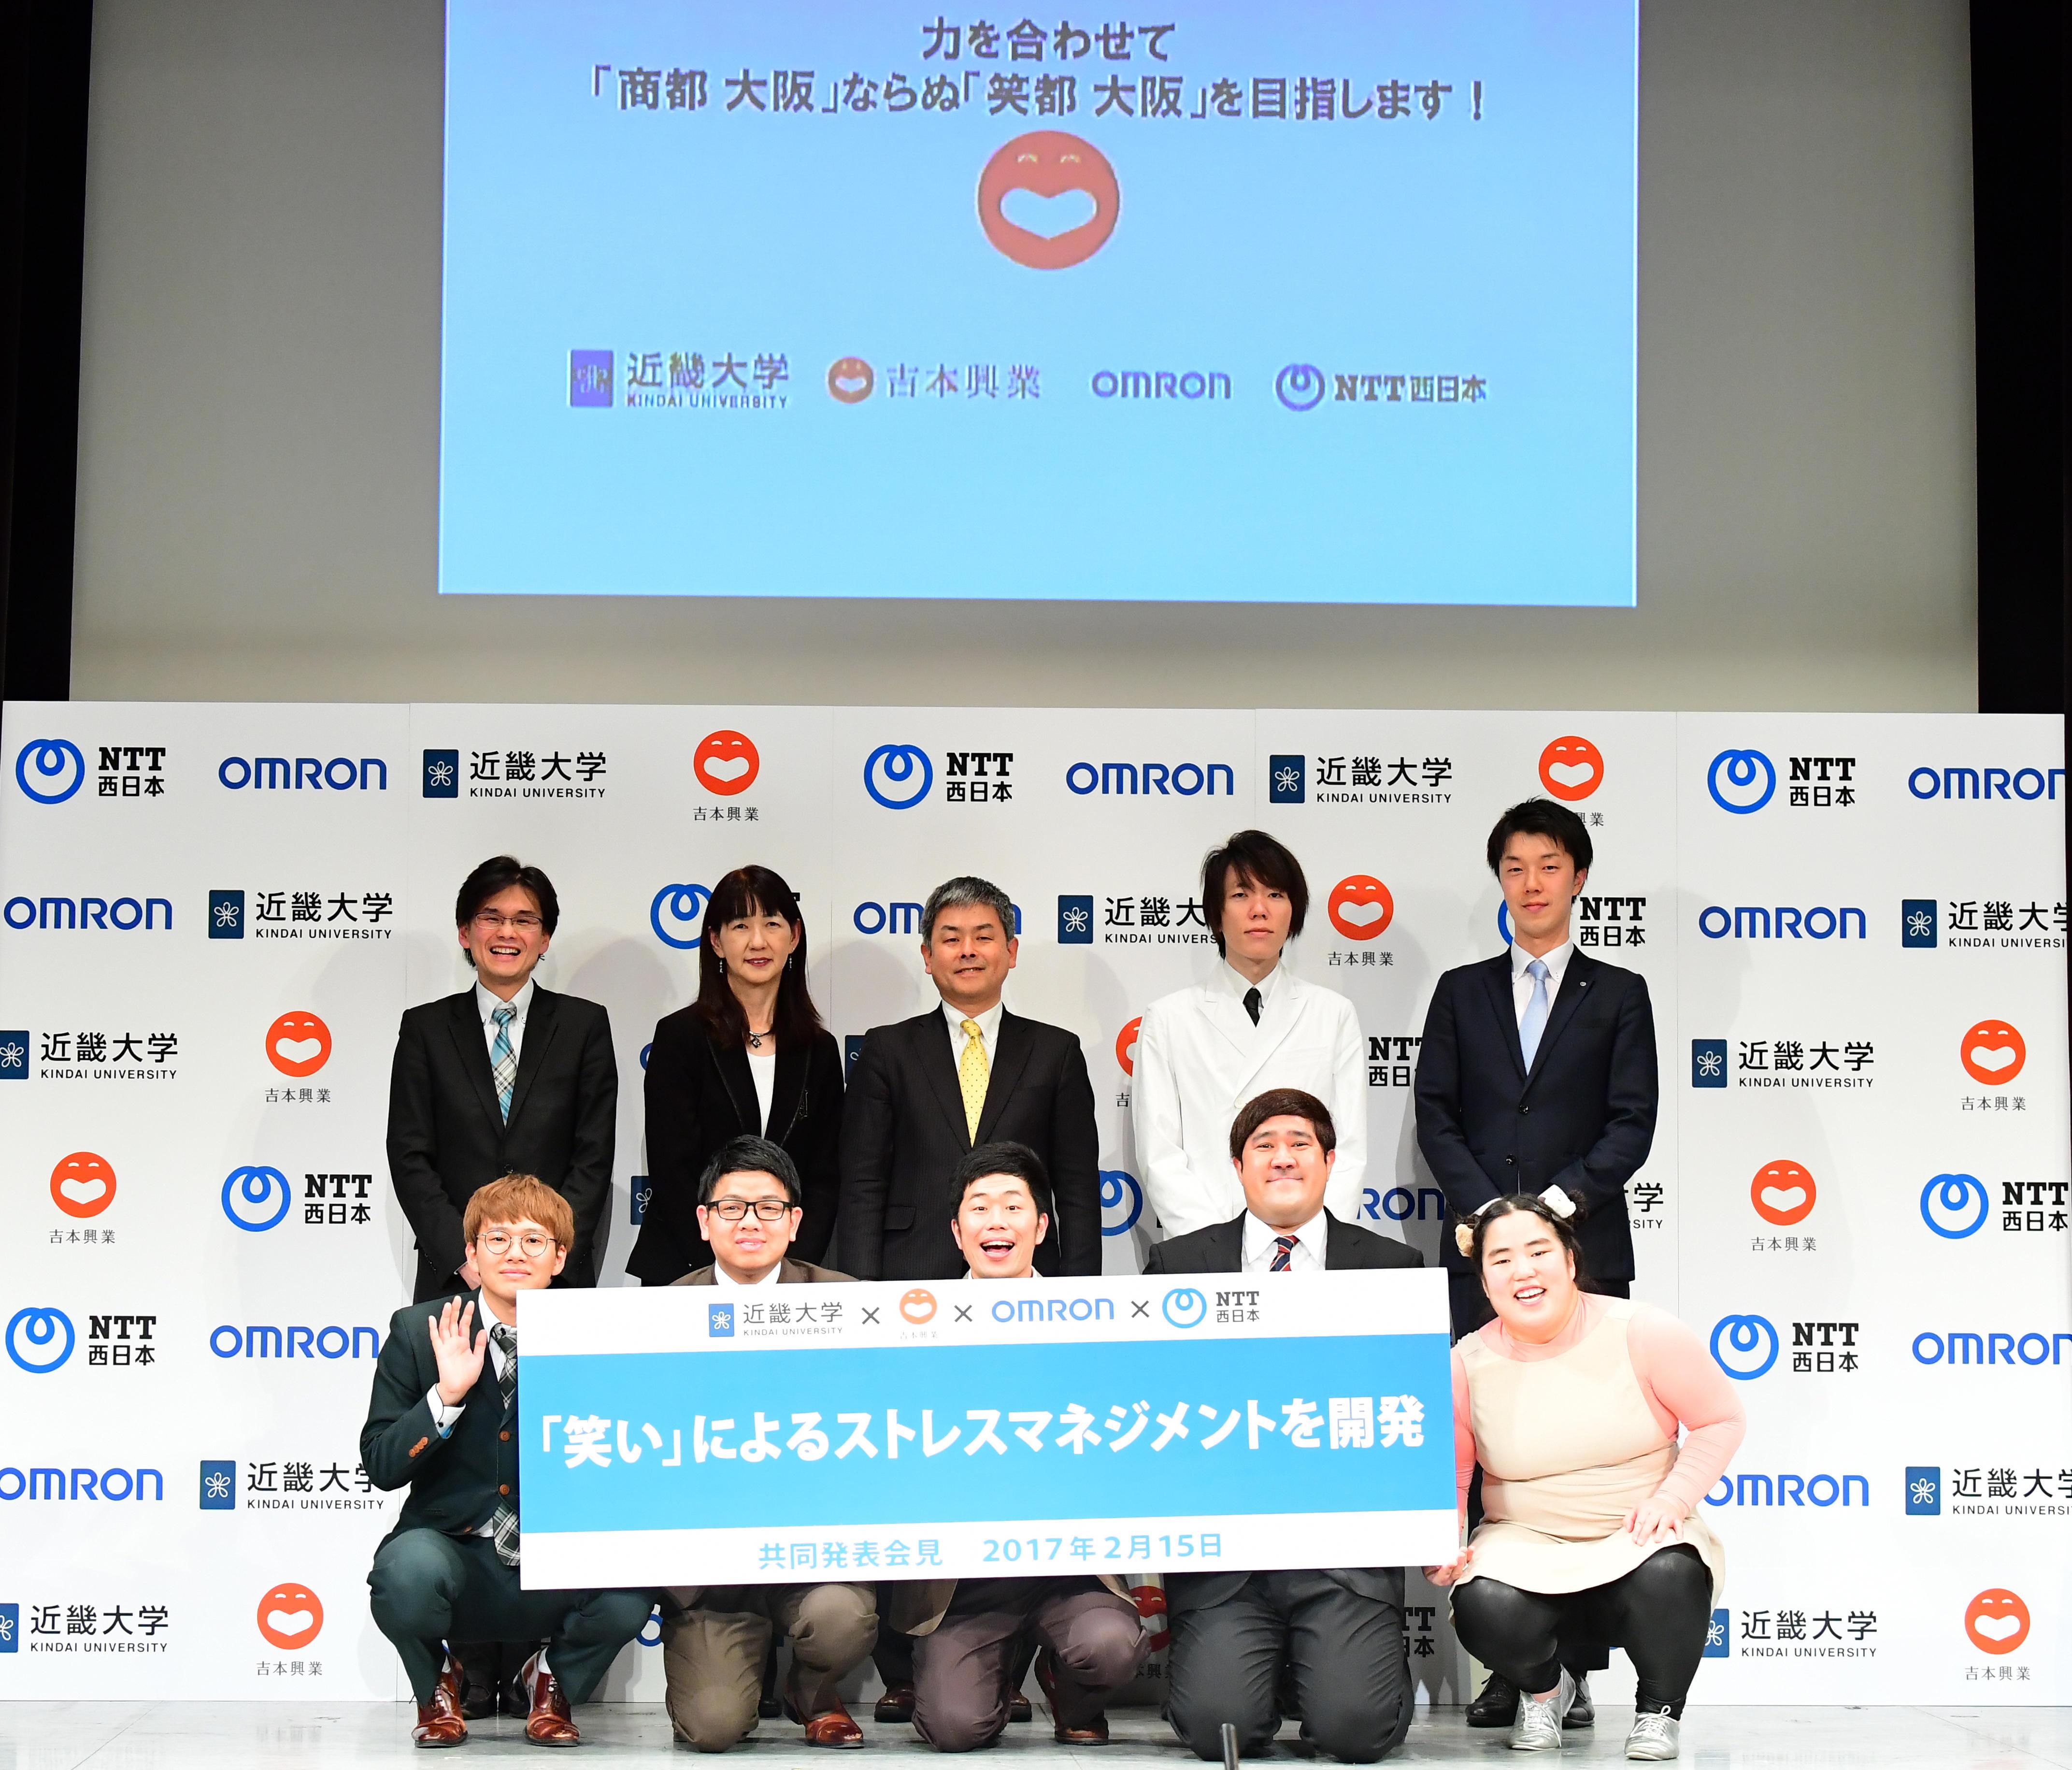 http://news.yoshimoto.co.jp/20170215203053-ee2247f44e8da12cacee79145d22e94d5e1703a4.jpg